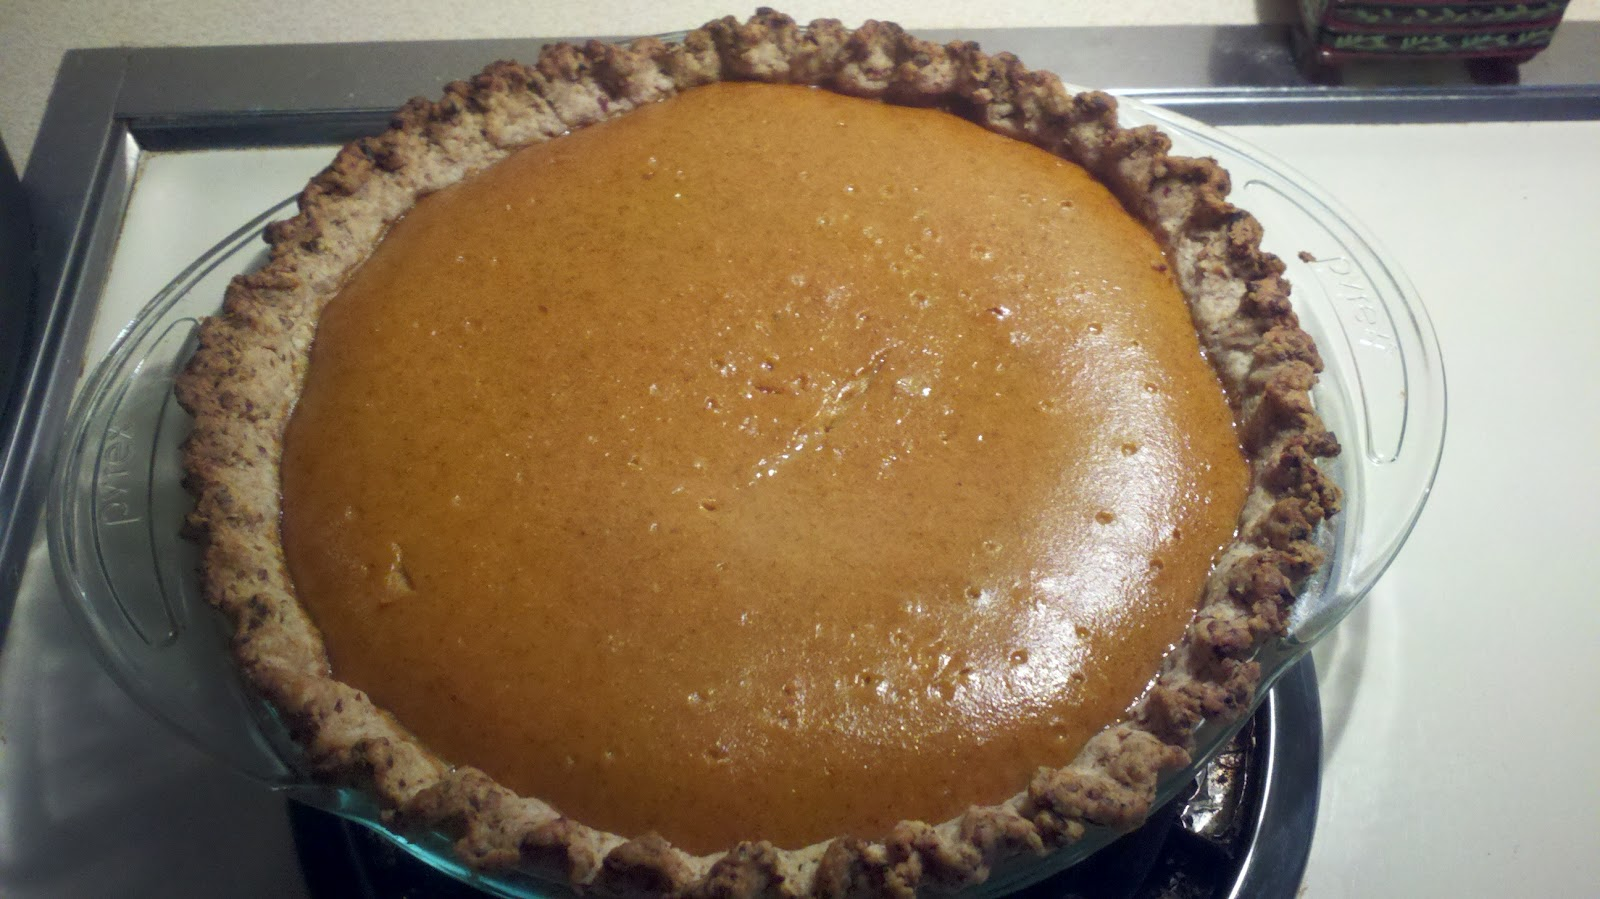 Chicken Soup for the Bowl: Spiced Pumpkin Custard Pie